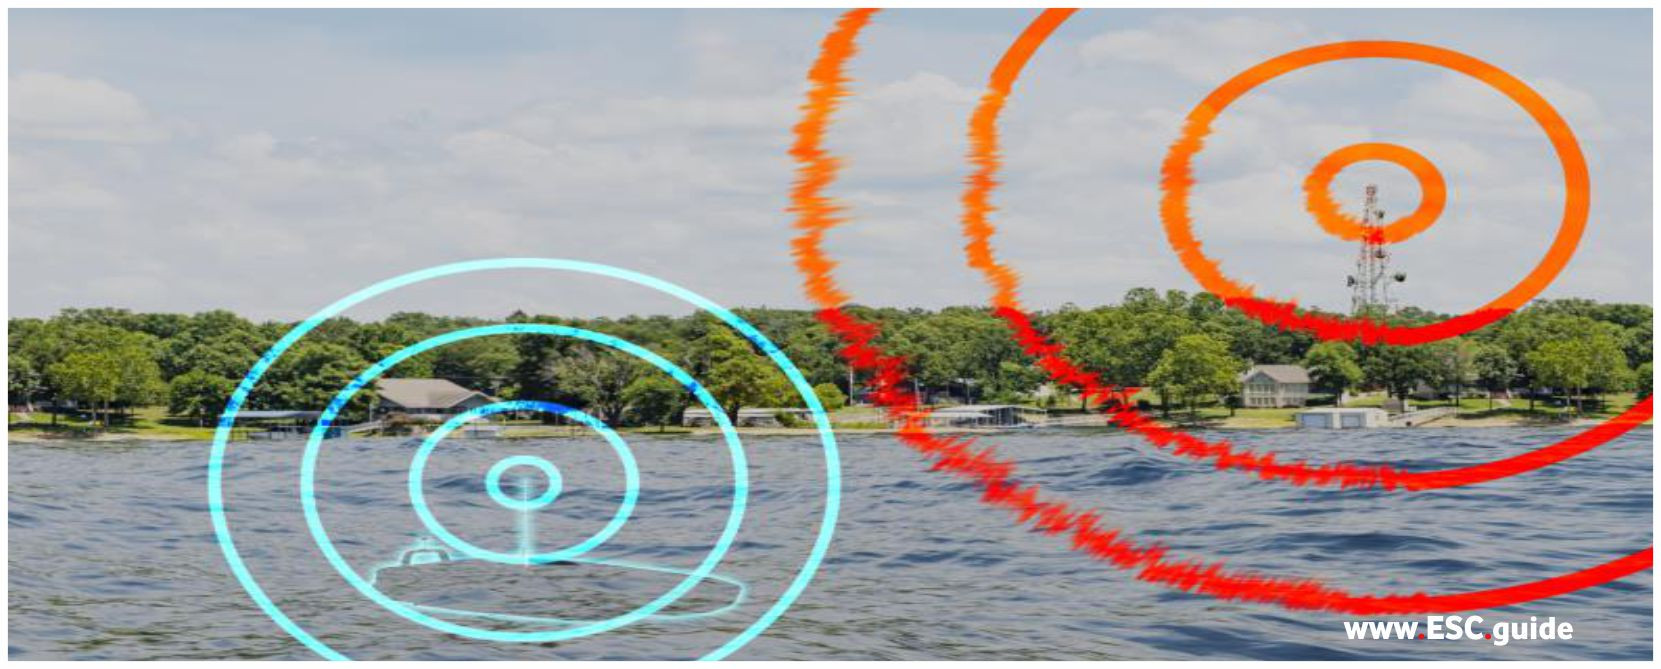 MANTAS EW is jamming signals from a shore antenna.